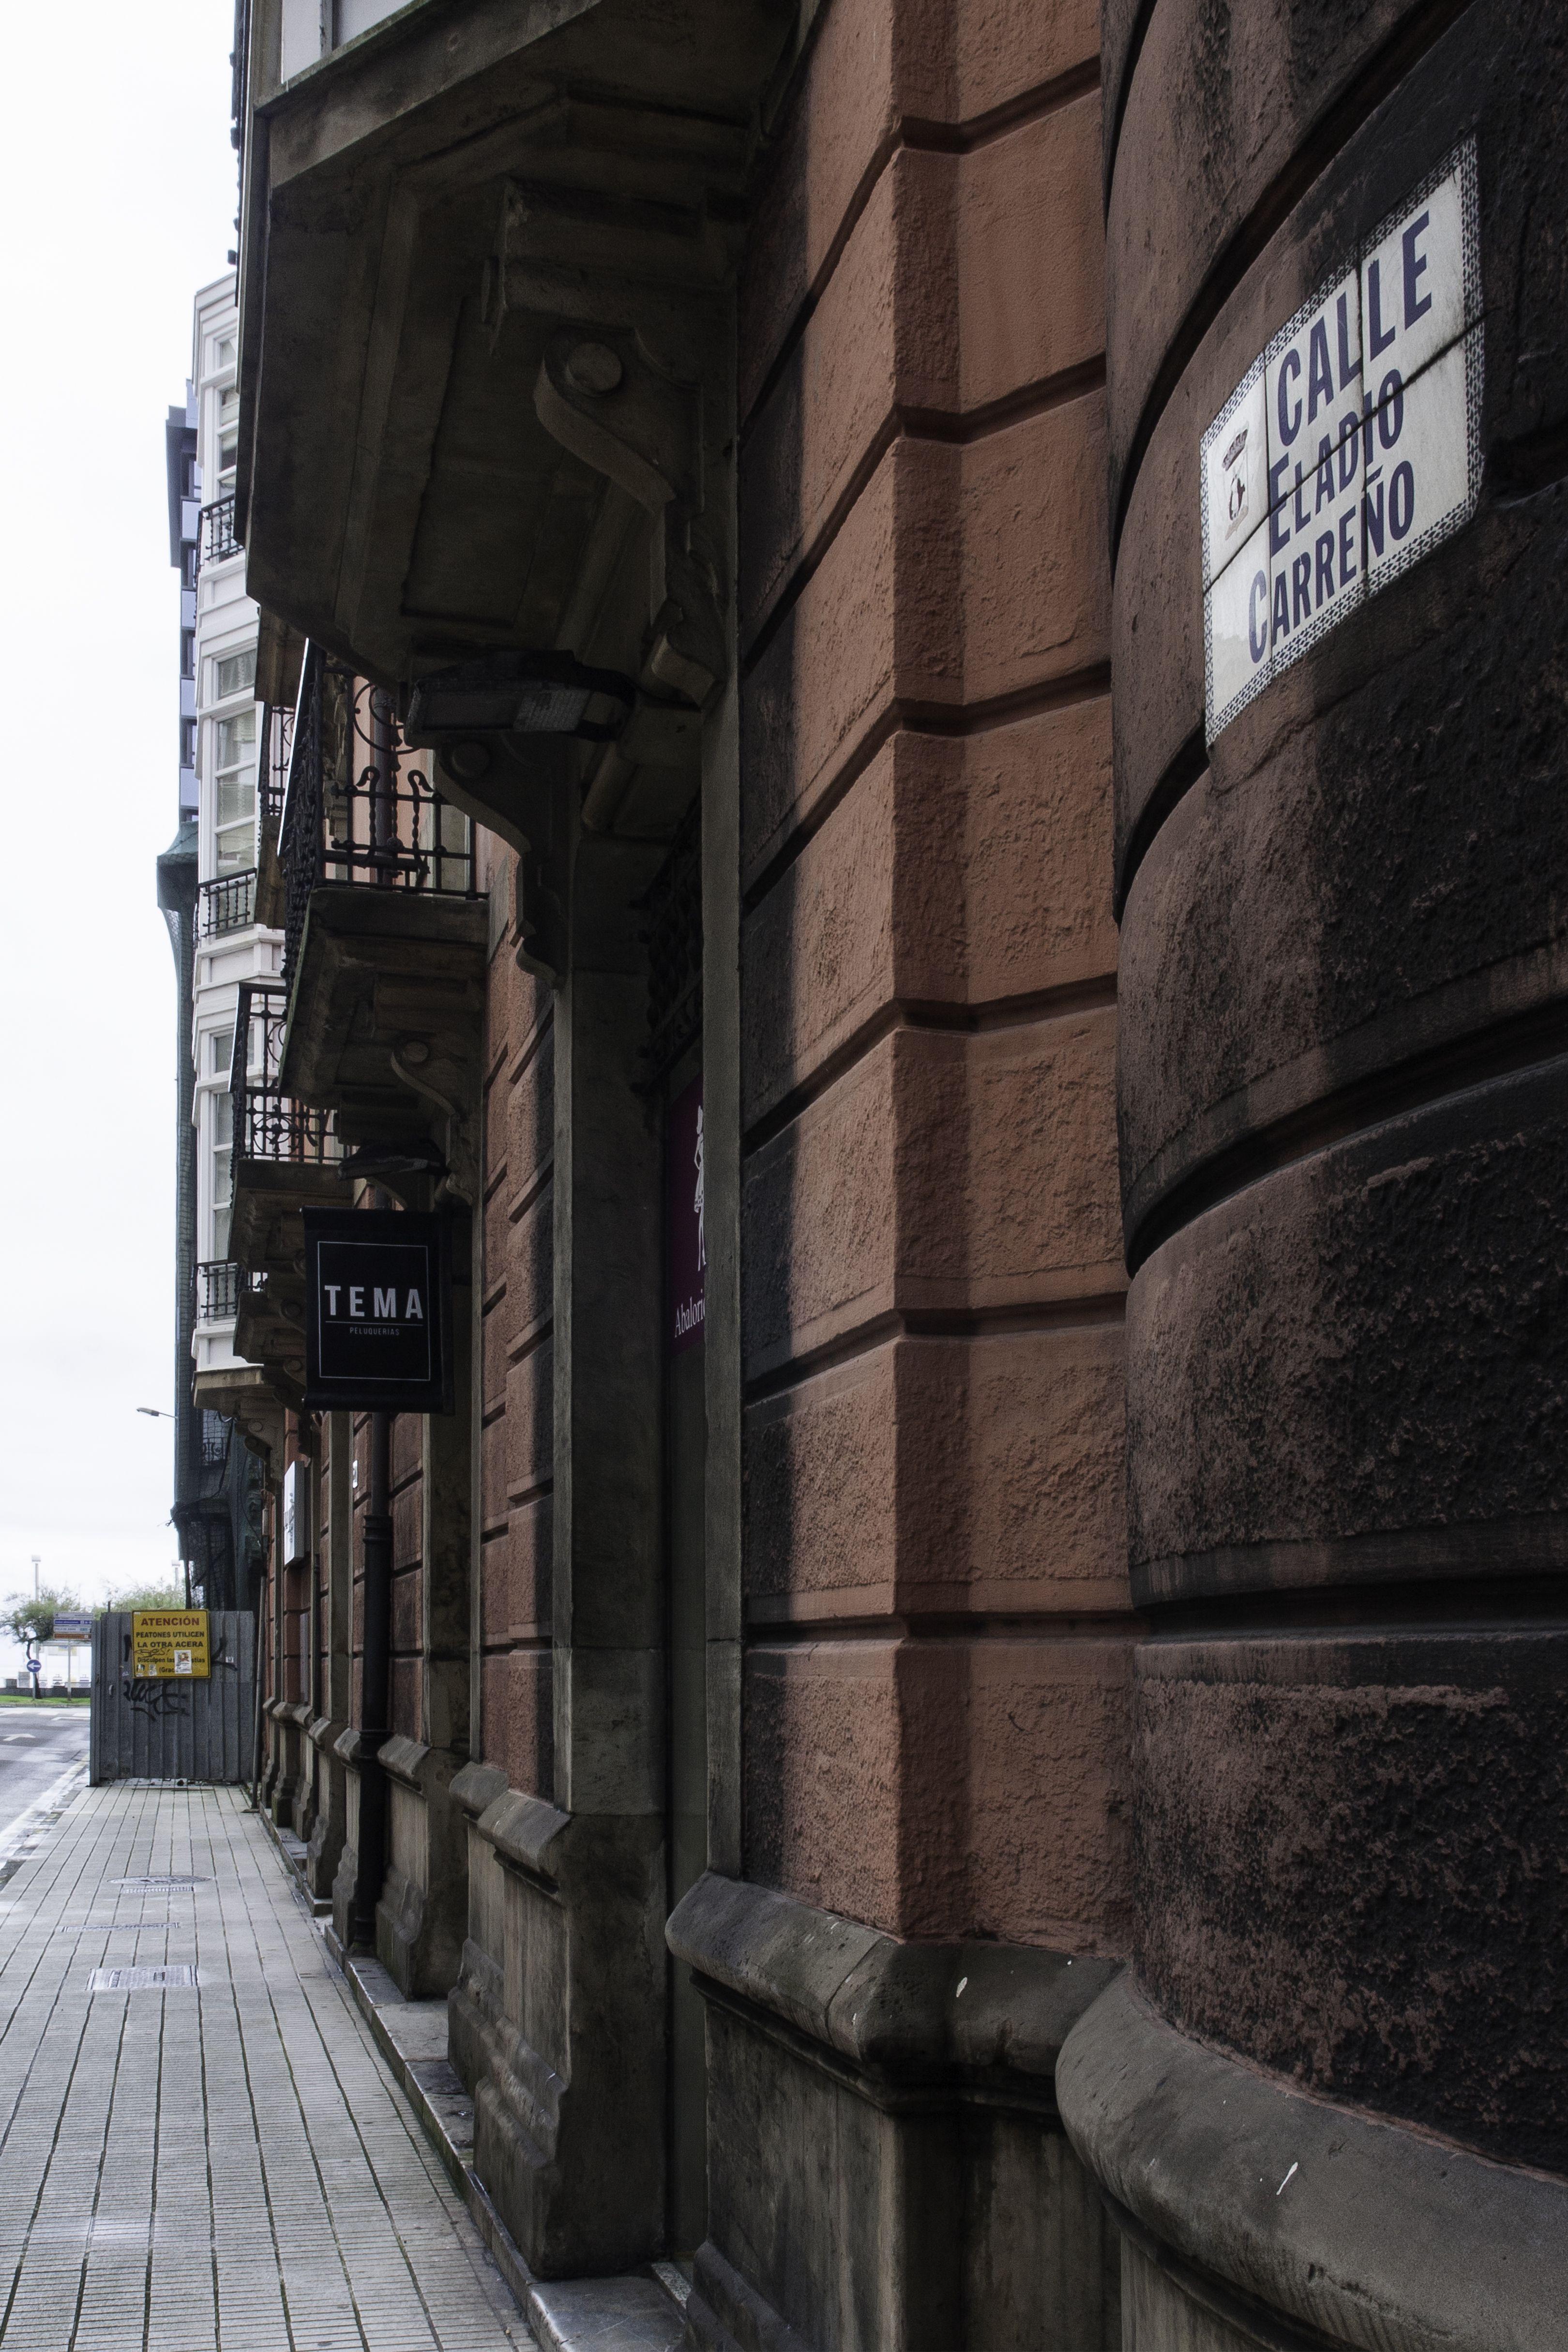 Productos de peluquería en Gijón